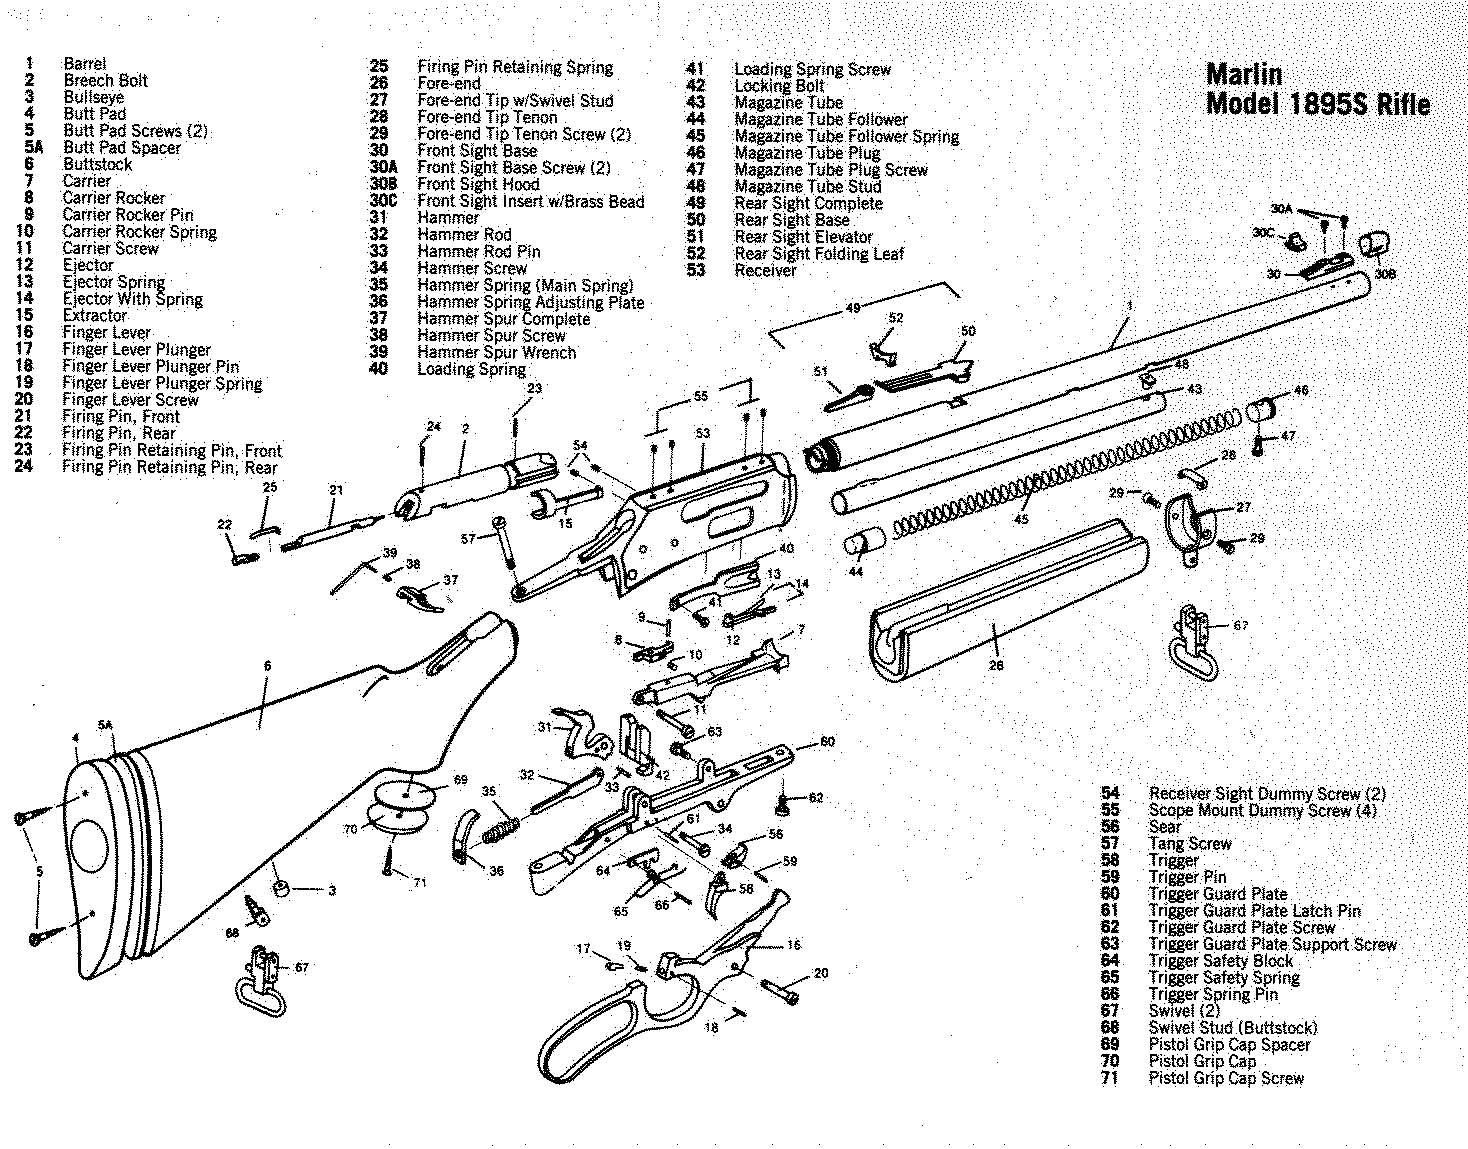 Remington 1100 Trigger Assembly Diagram Remington870partsdiagram Nylon 66 Parts